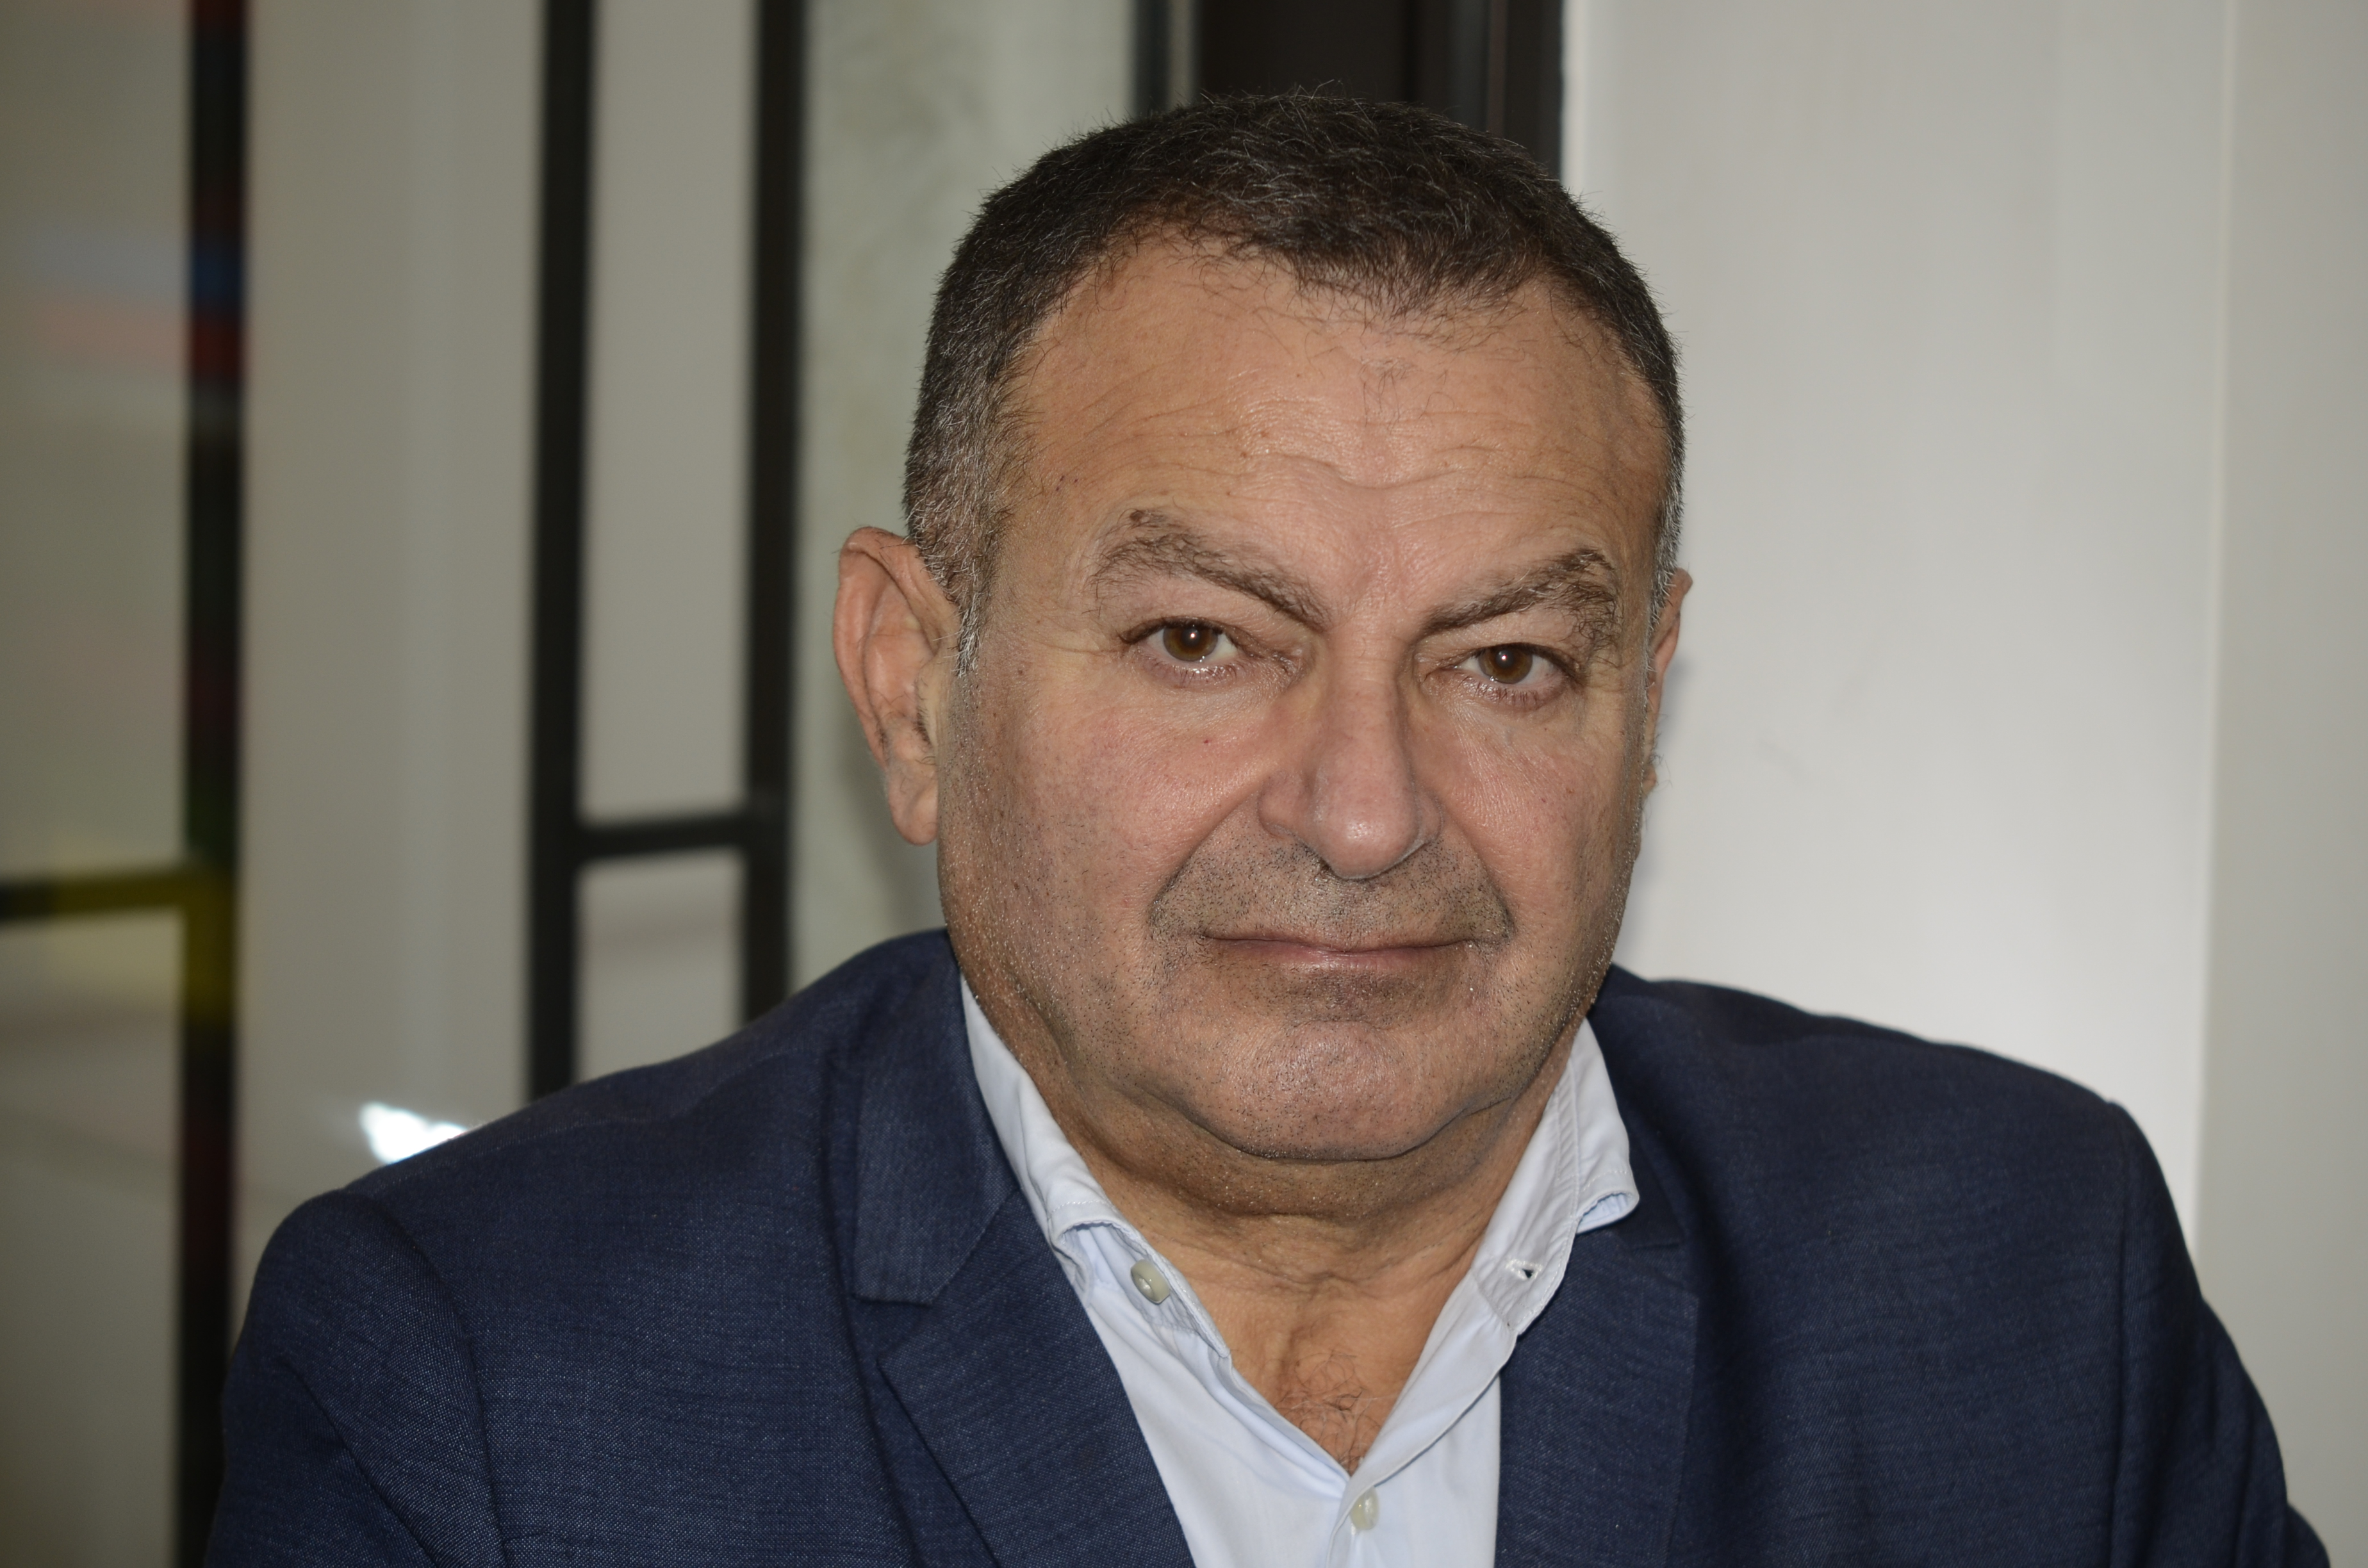 Dott. Salvatore Mazzara